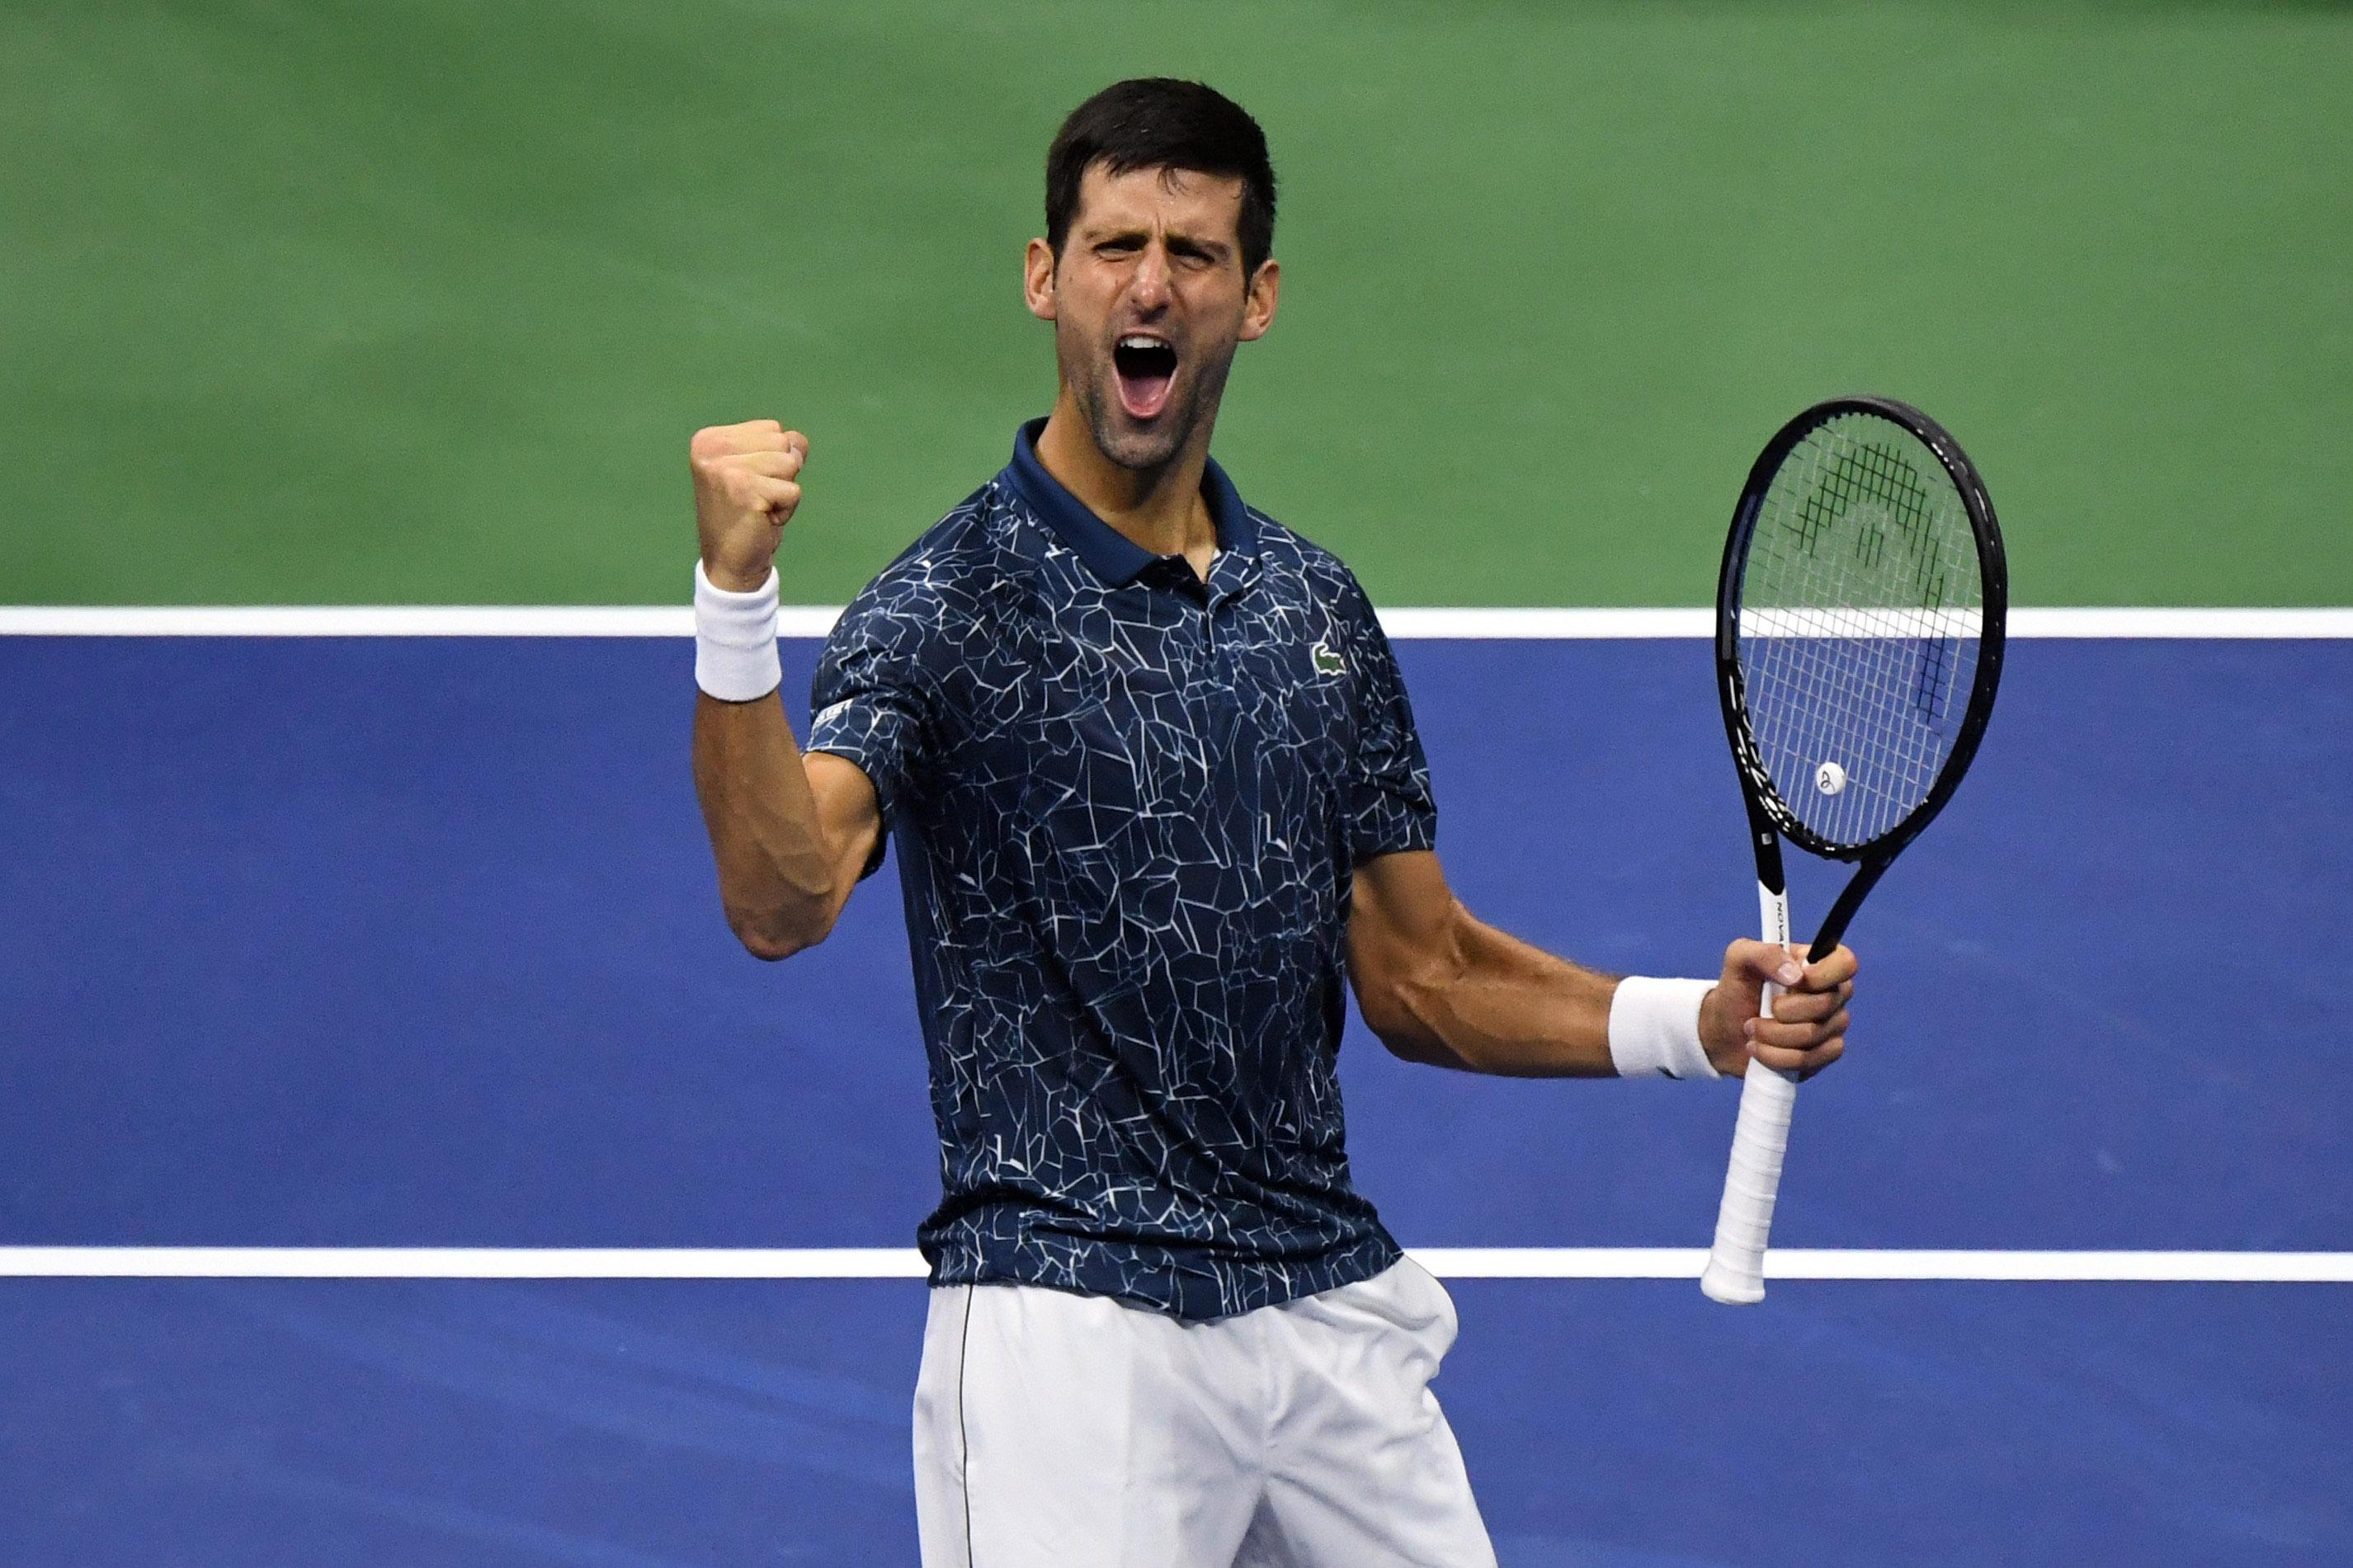 Djokovic is hoping to equally Pete Sampras' record